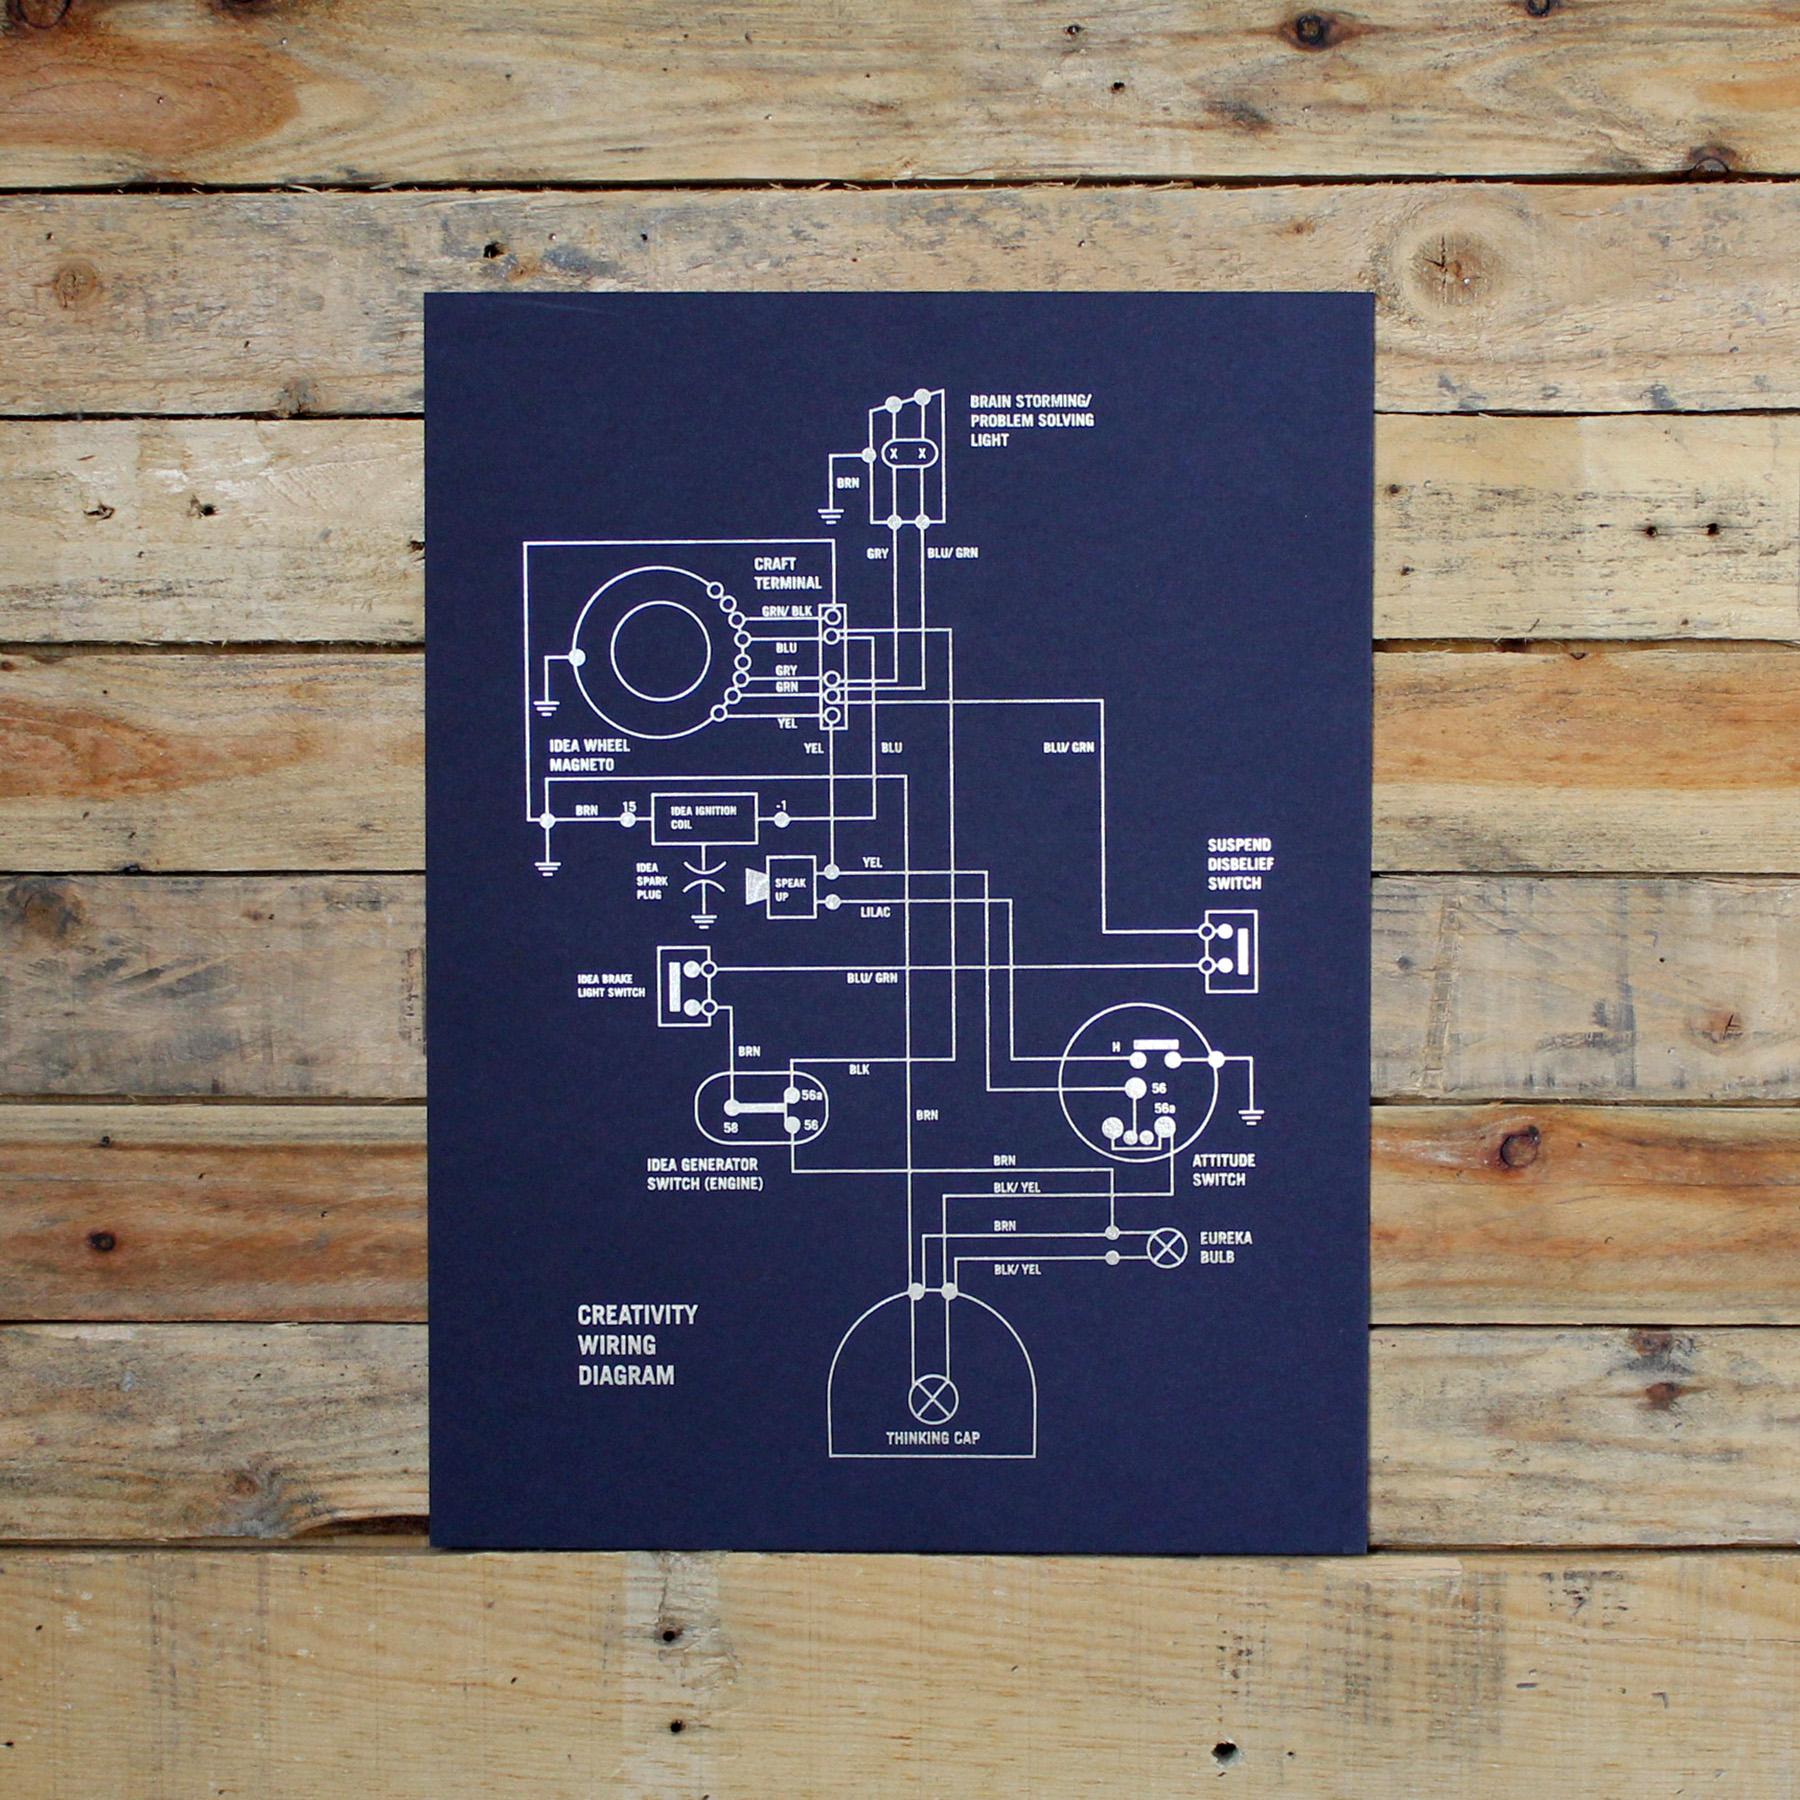 medium resolution of creativity wiring diagram vincent lai prev next